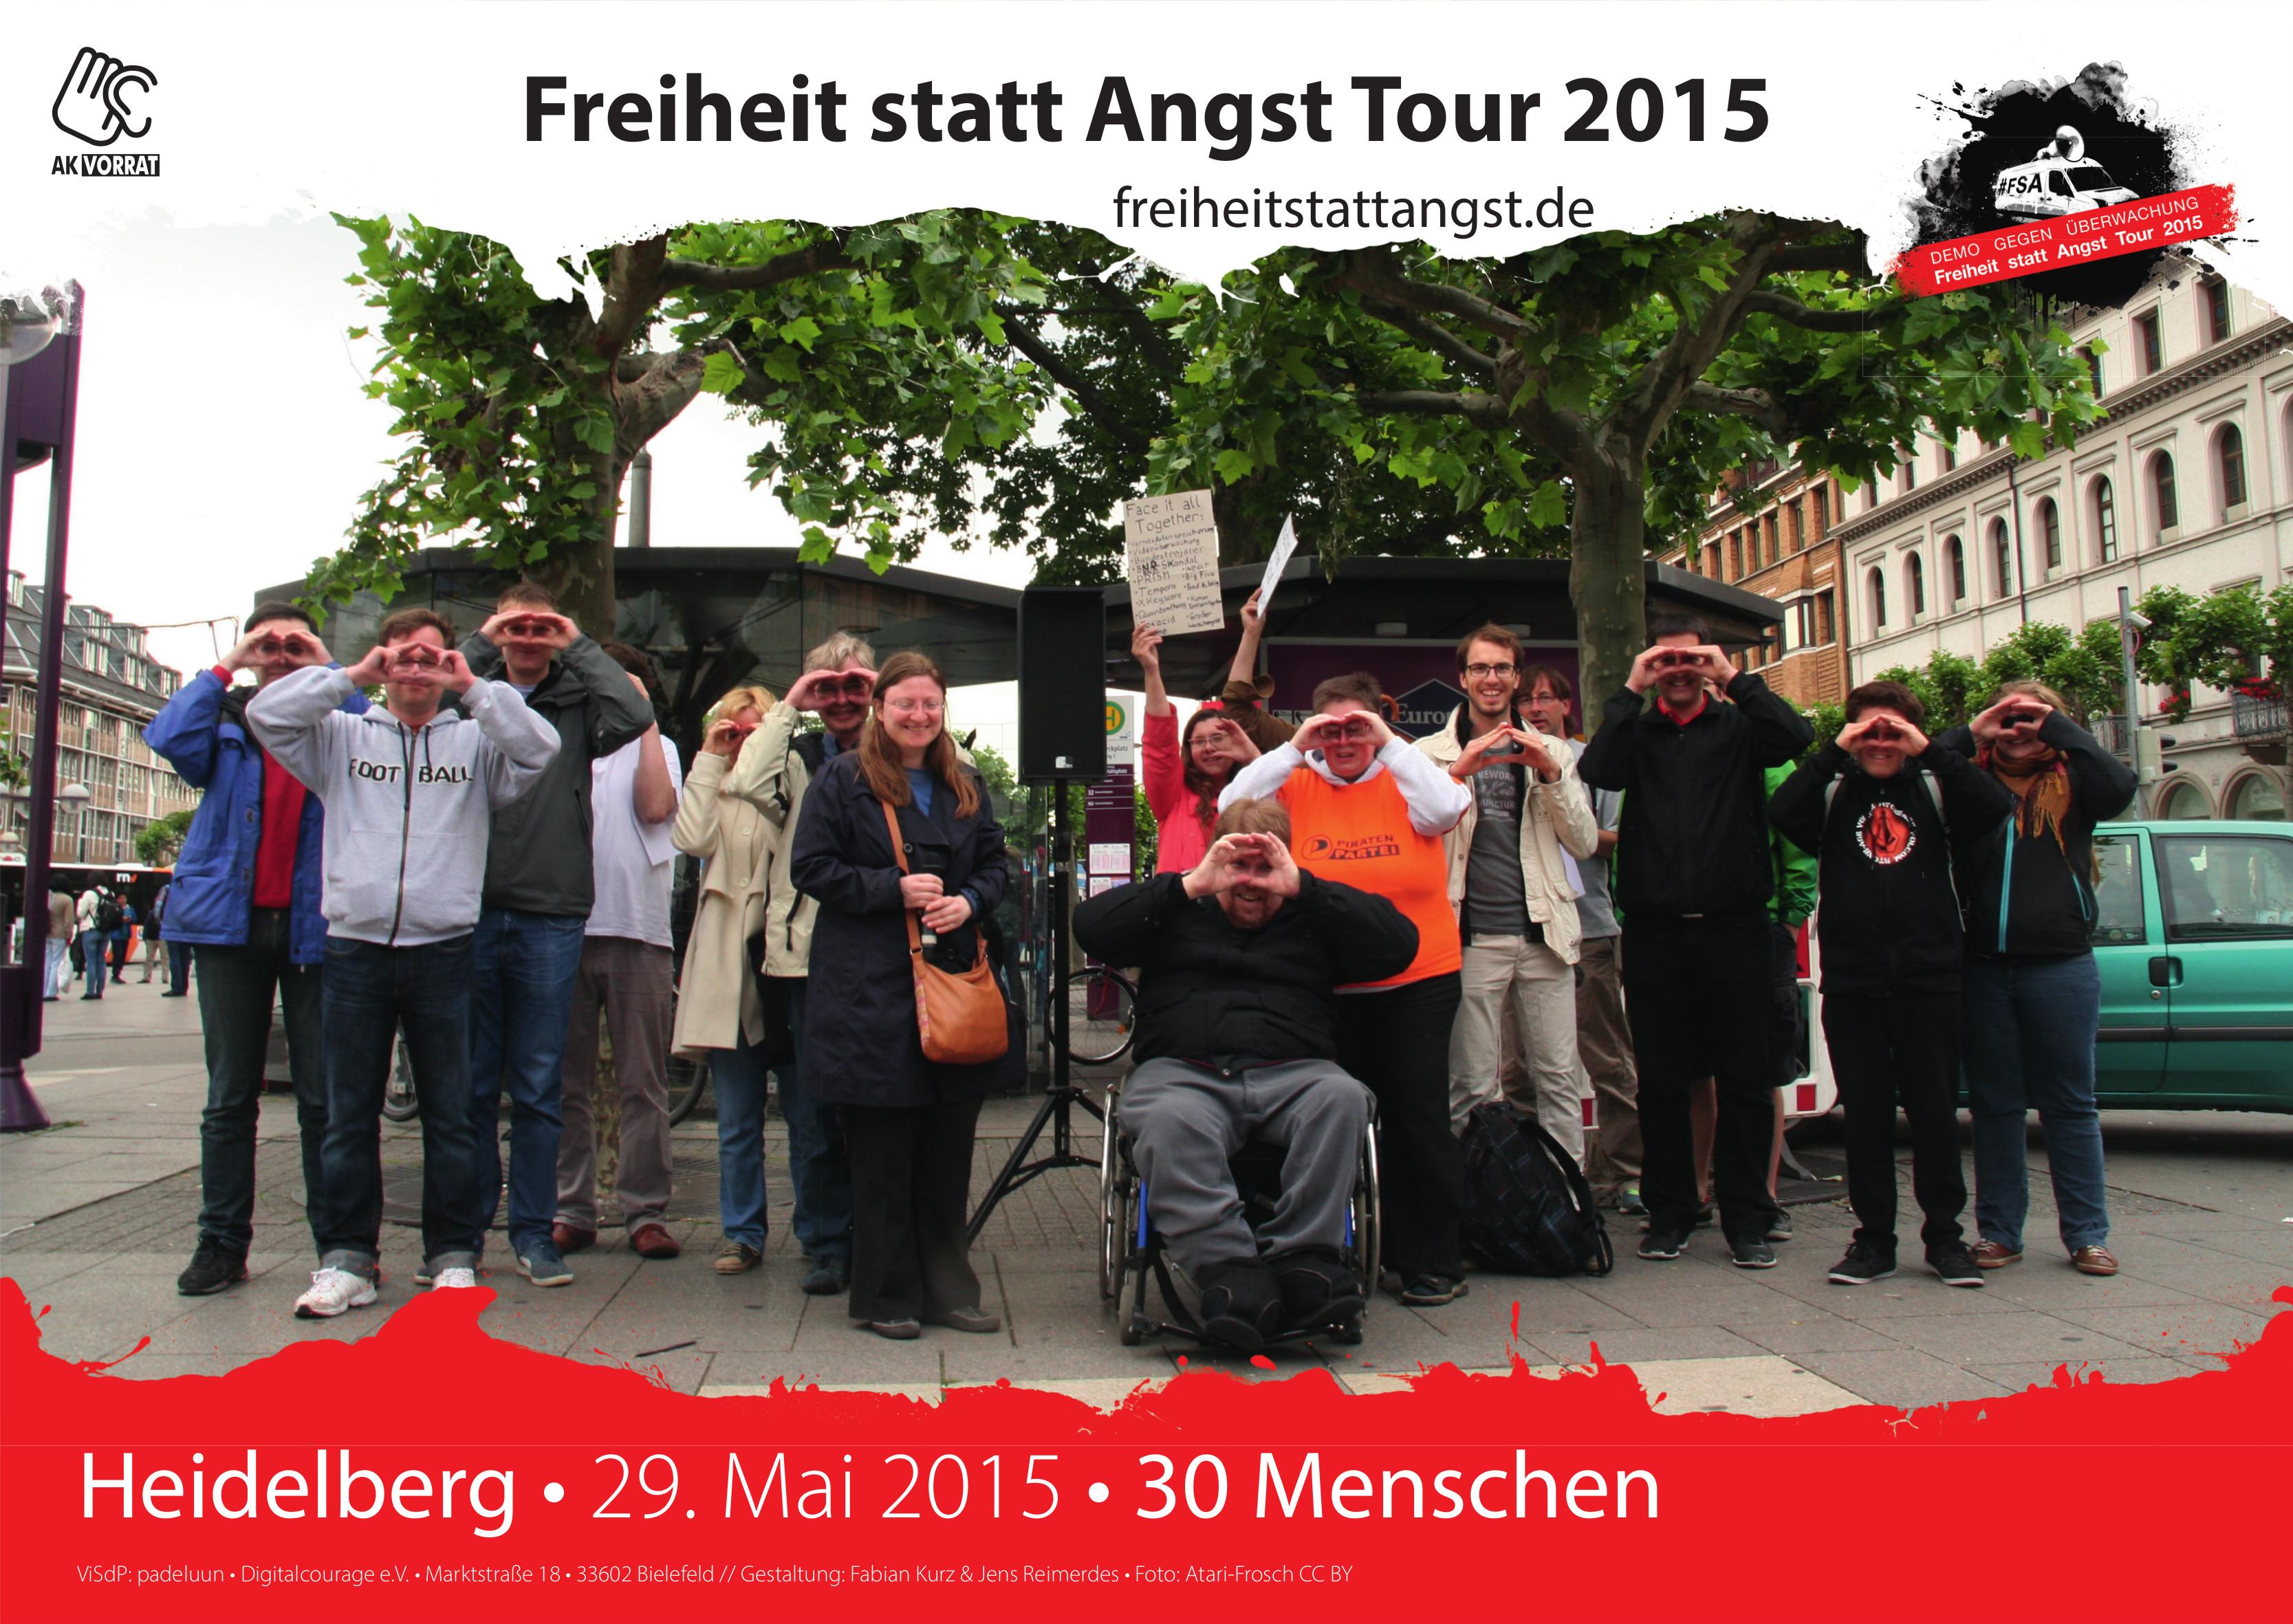 Heidelberg am 29. Mai 2015.